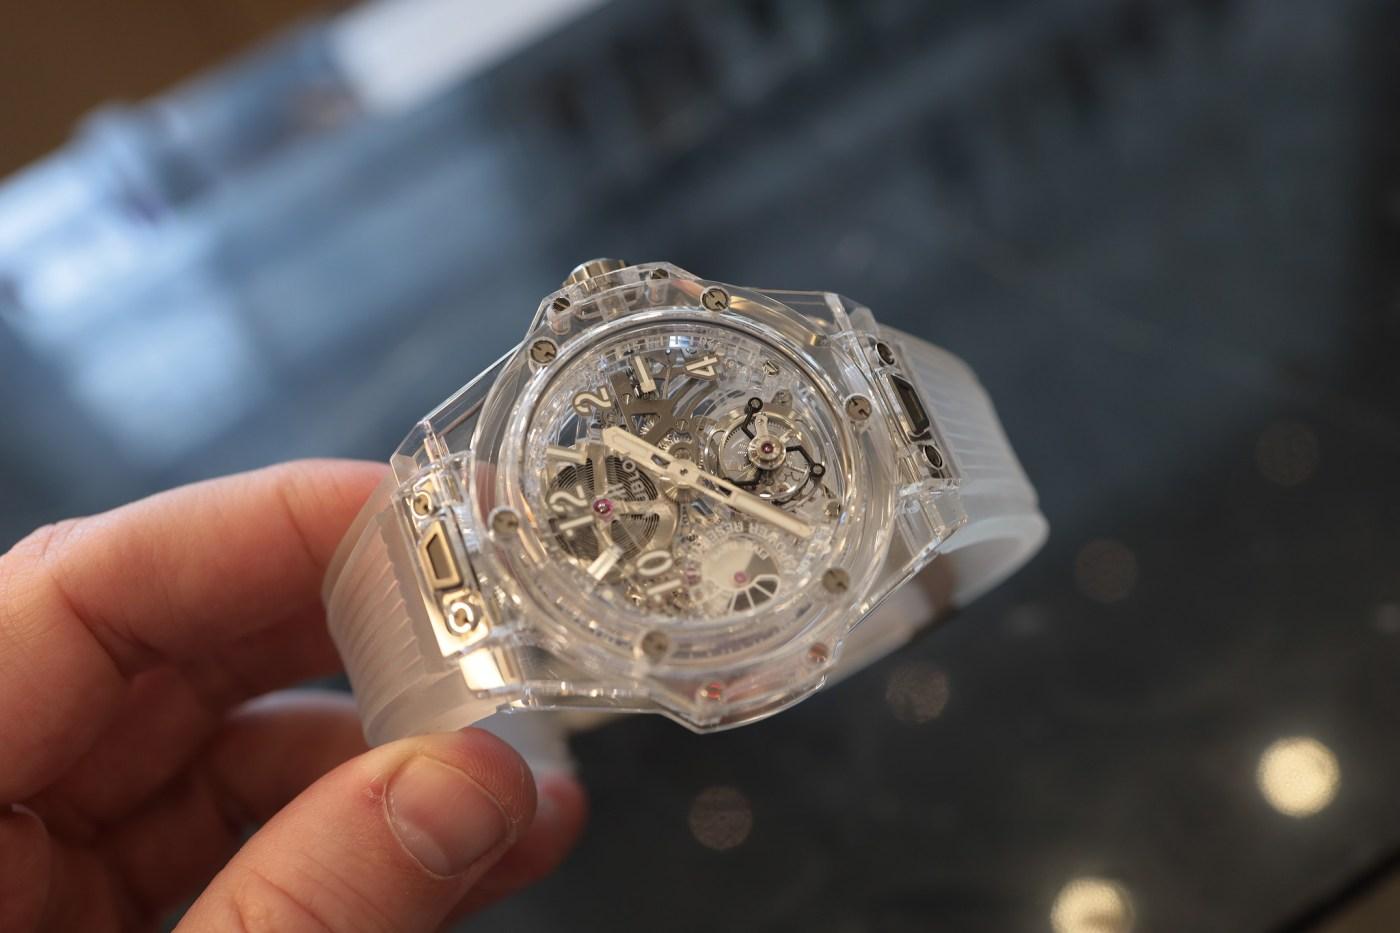 Hublot Big Bang Tourbillon 5 Days Sapphire, $148K